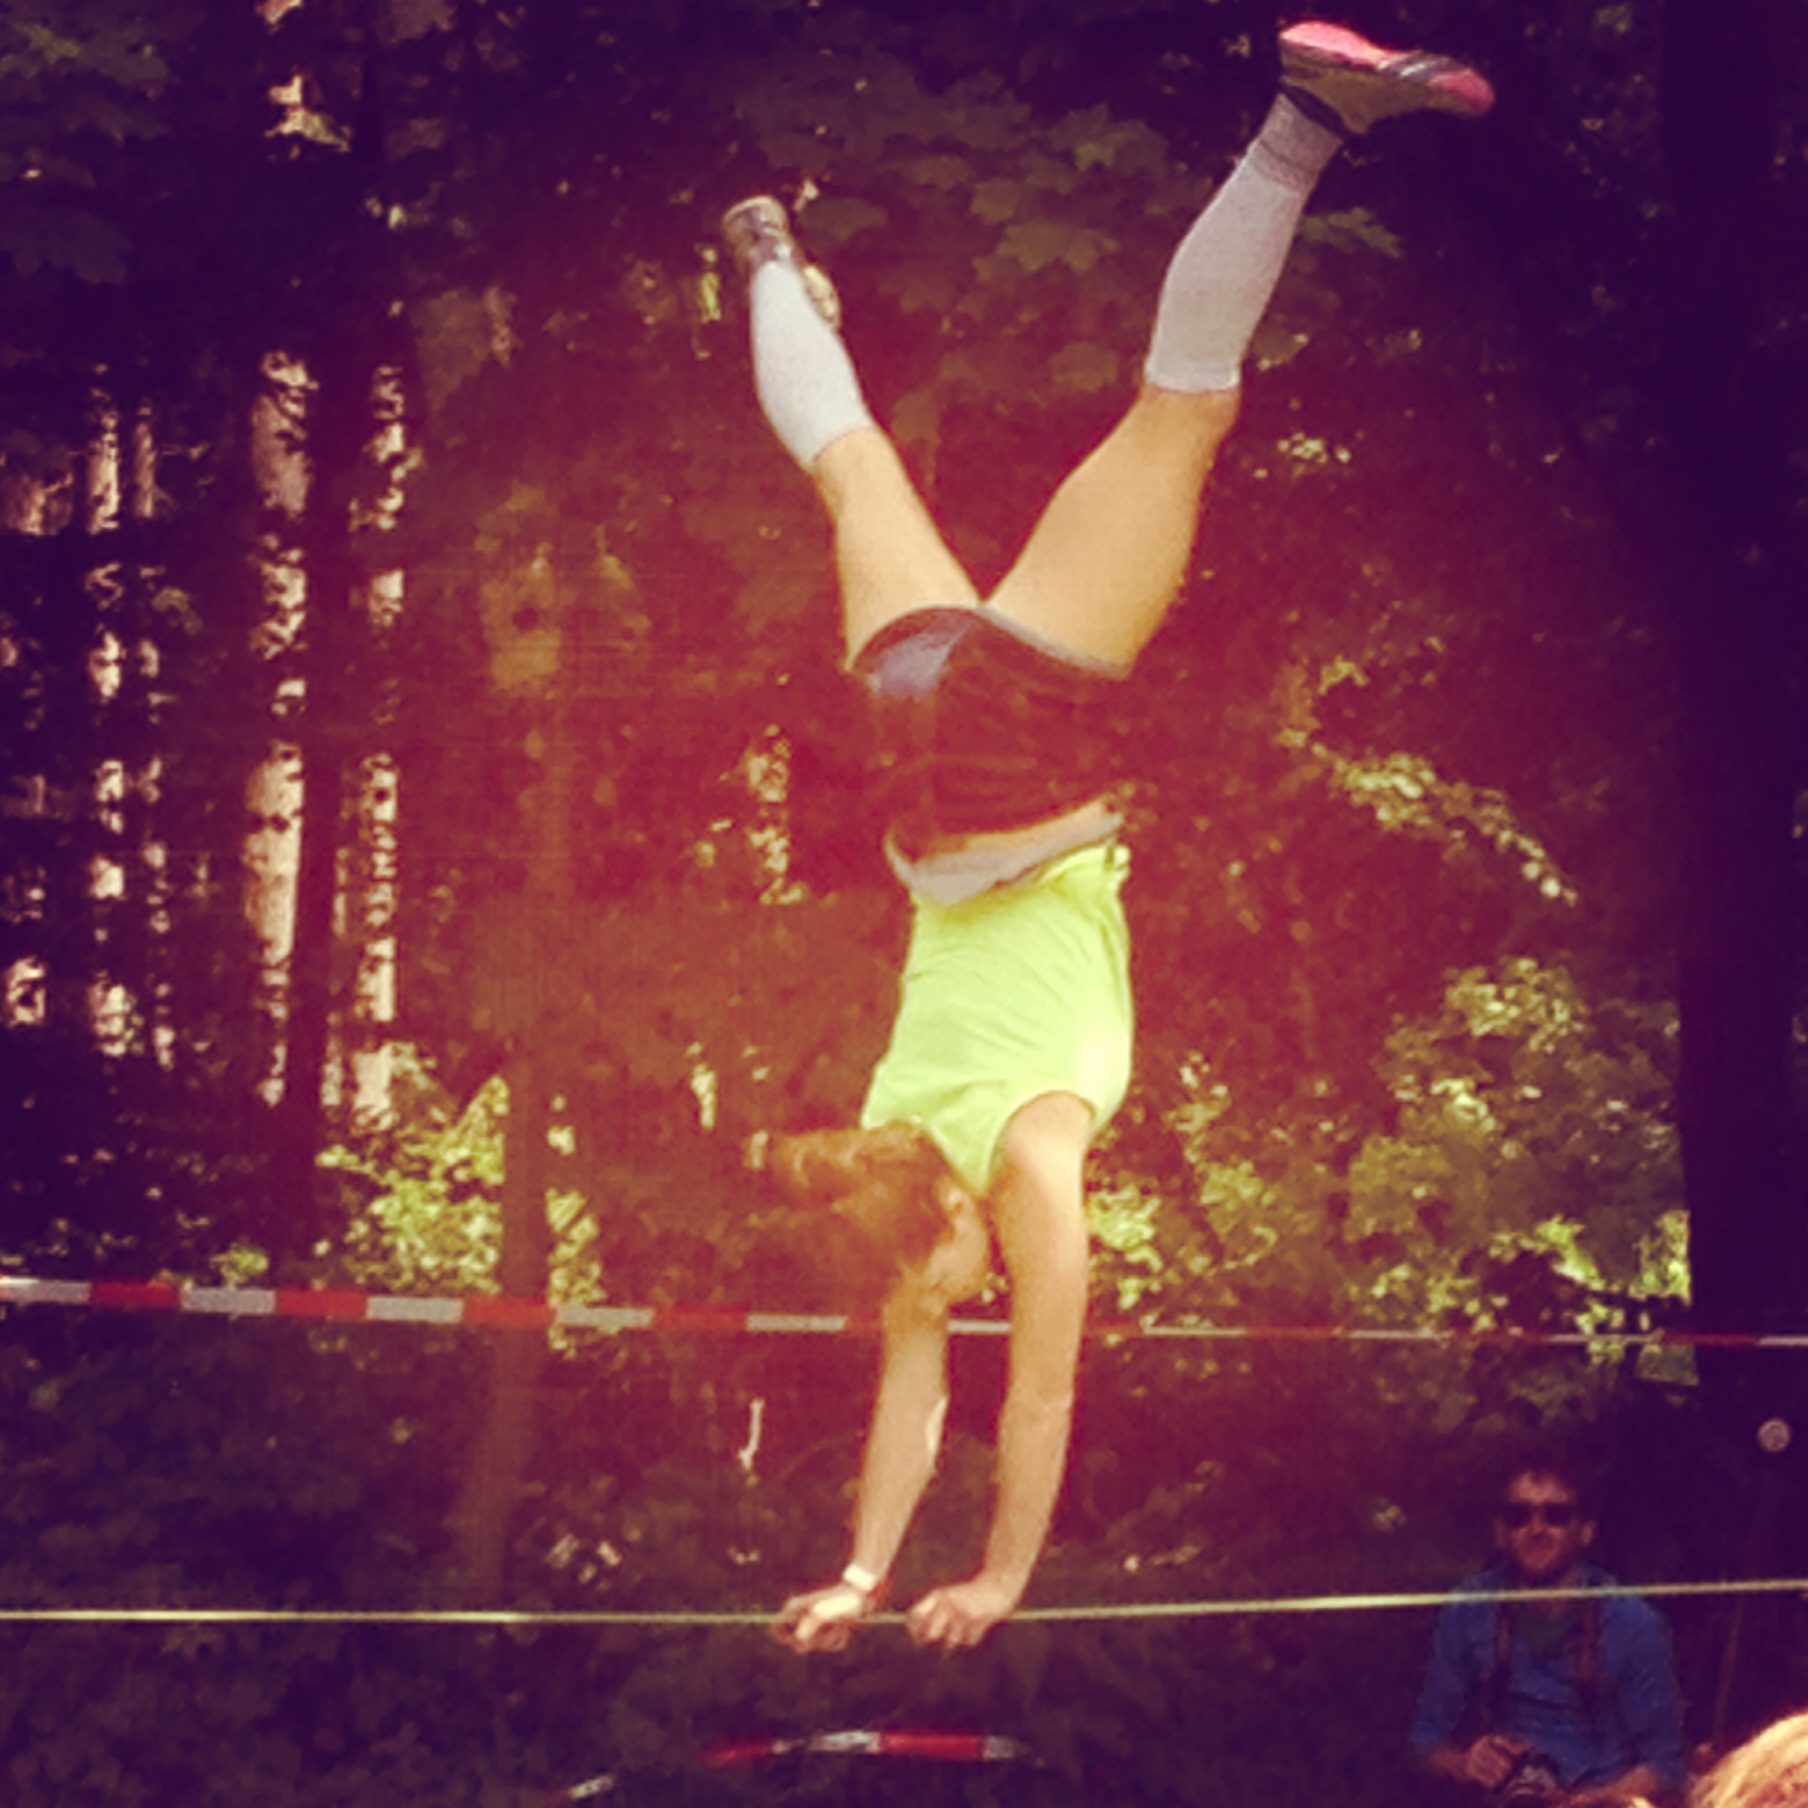 Akrobatik beim Slacklinefestival